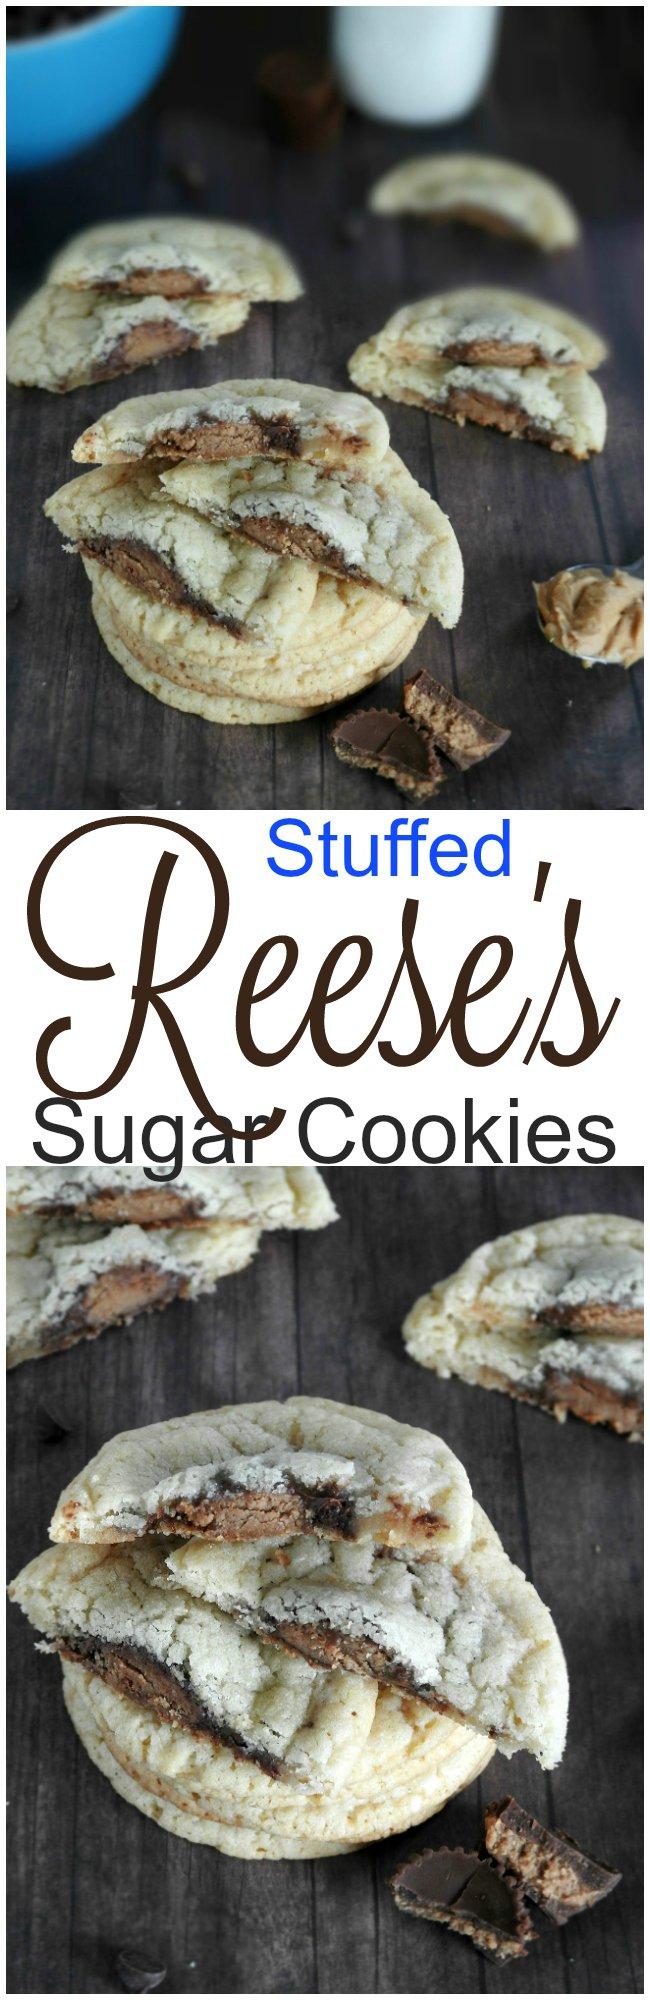 stuffed-reeses-sugar-cookies. sewlicioushomedecor.com